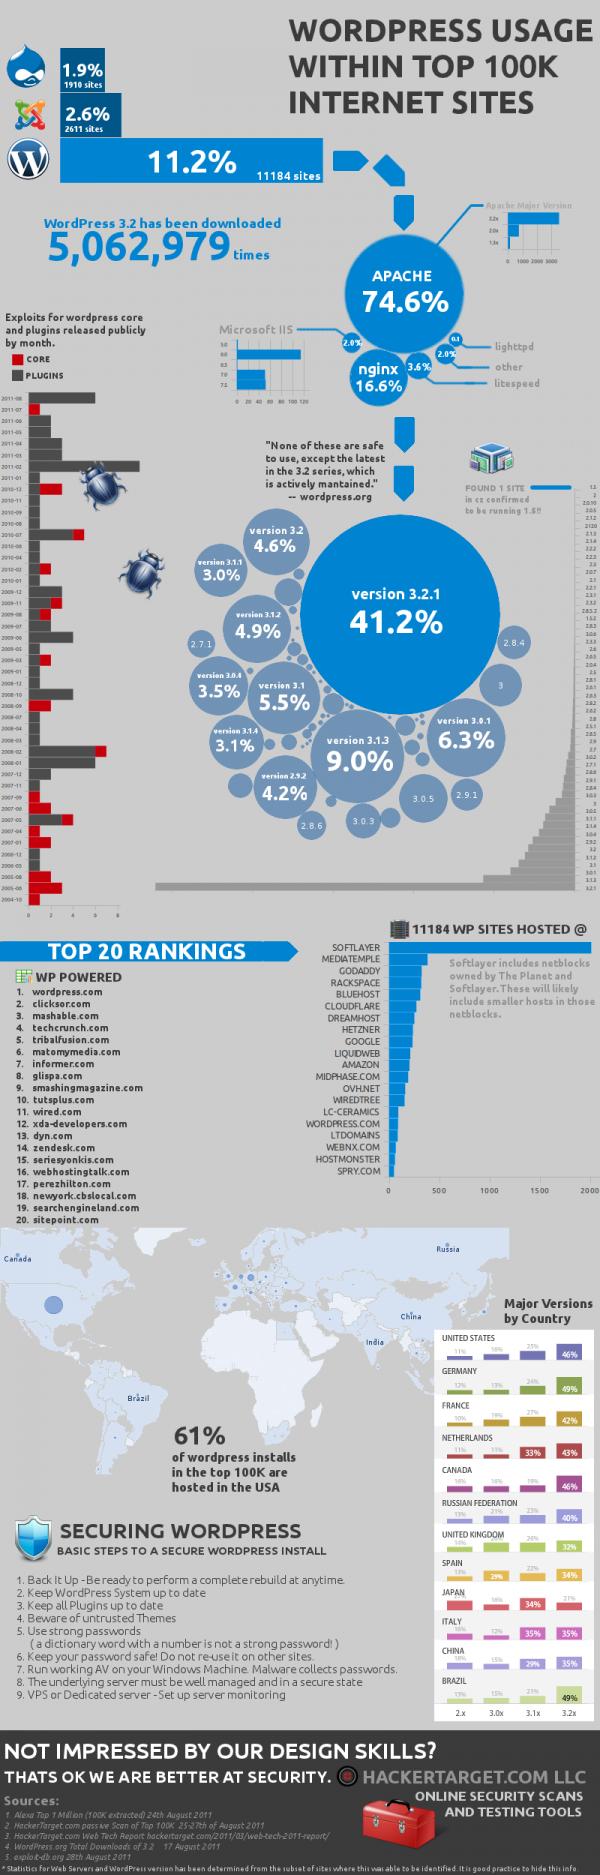 infographic-on-social-media-21